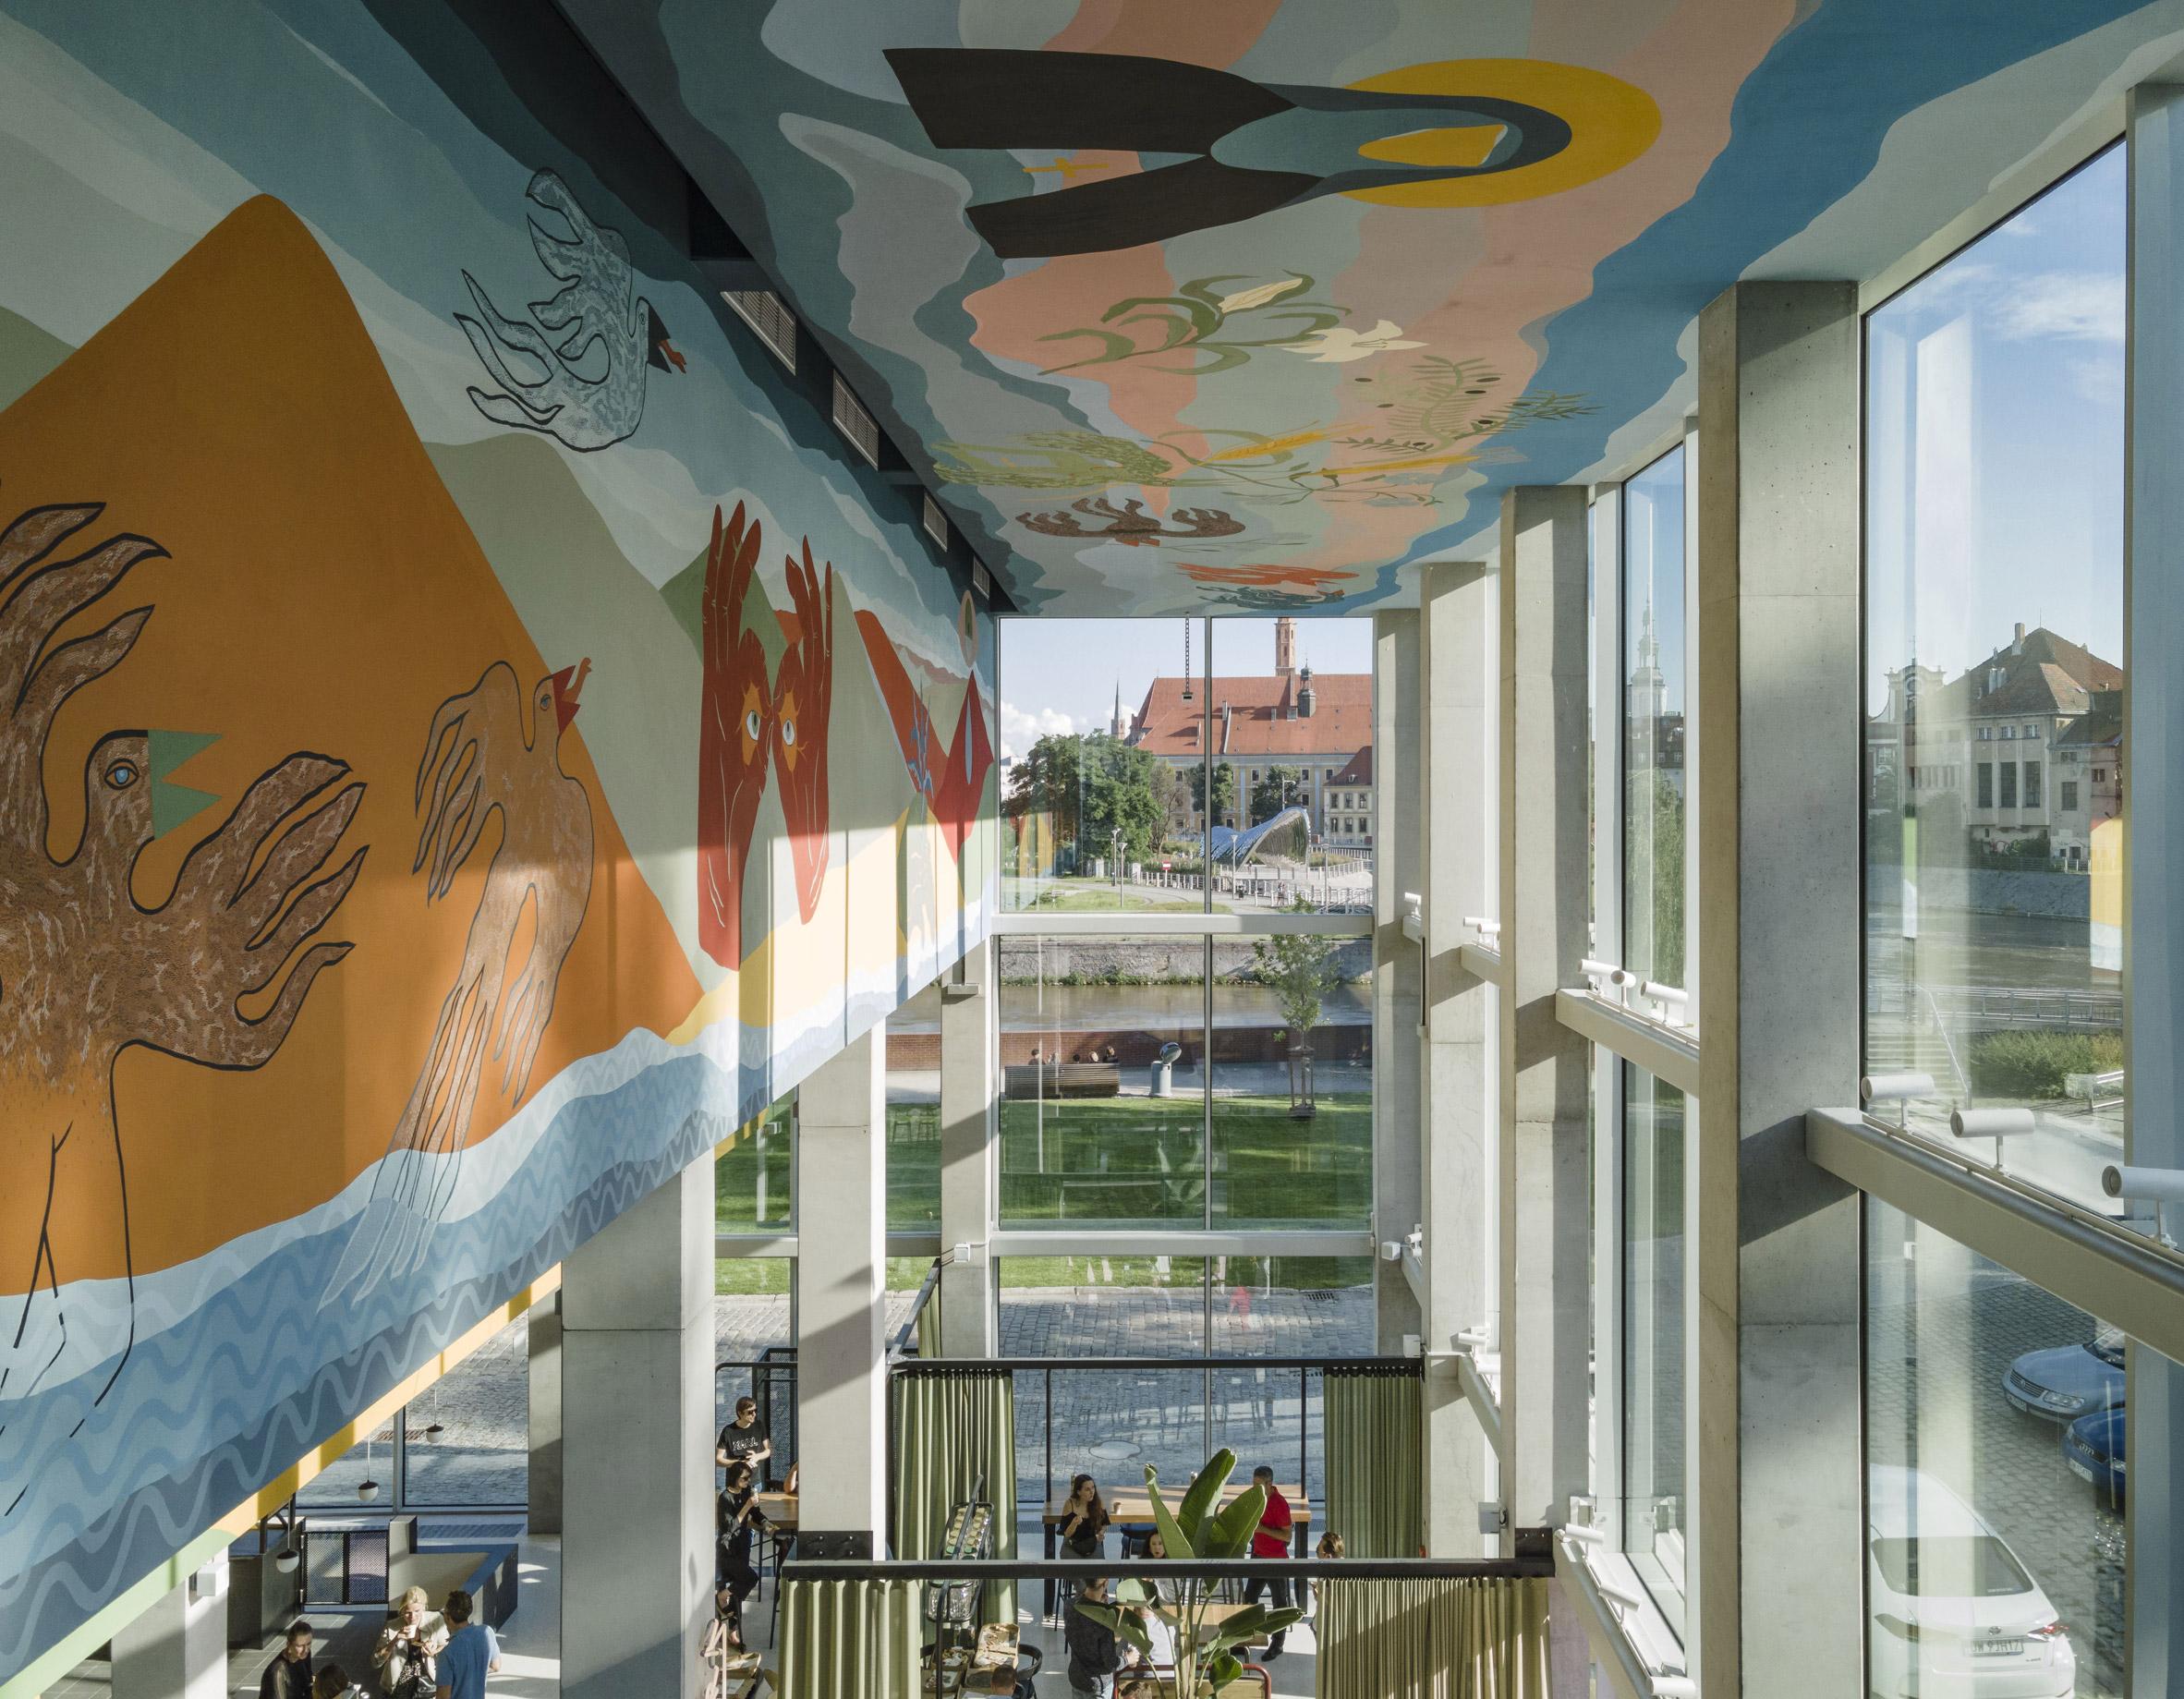 Mural at Concordia Design by MVRDV and Alicja Biala